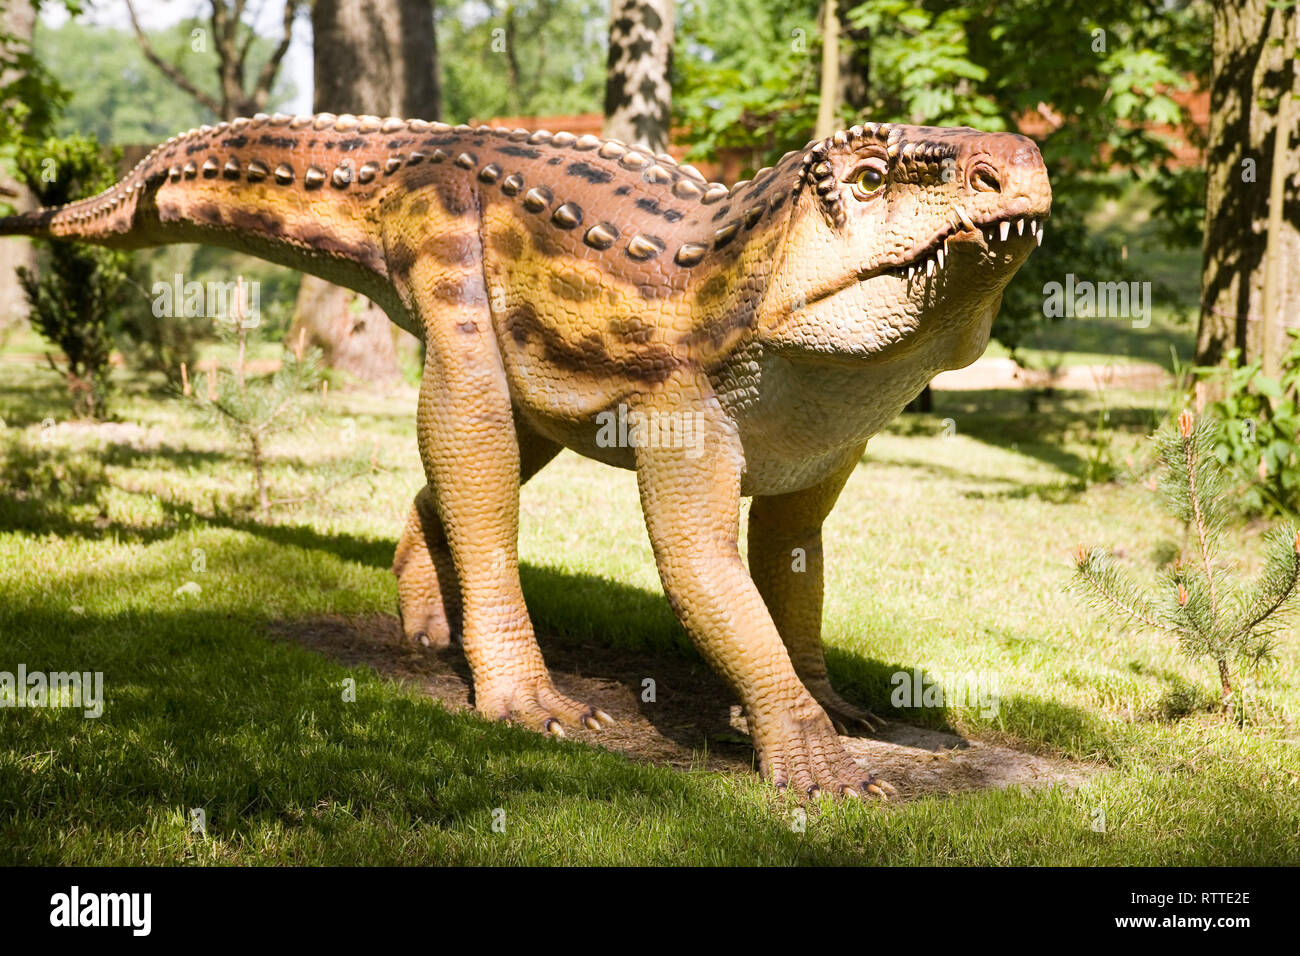 Jurassic park - set of dinosaurs - Ornithosuchus longidens - Stock Image